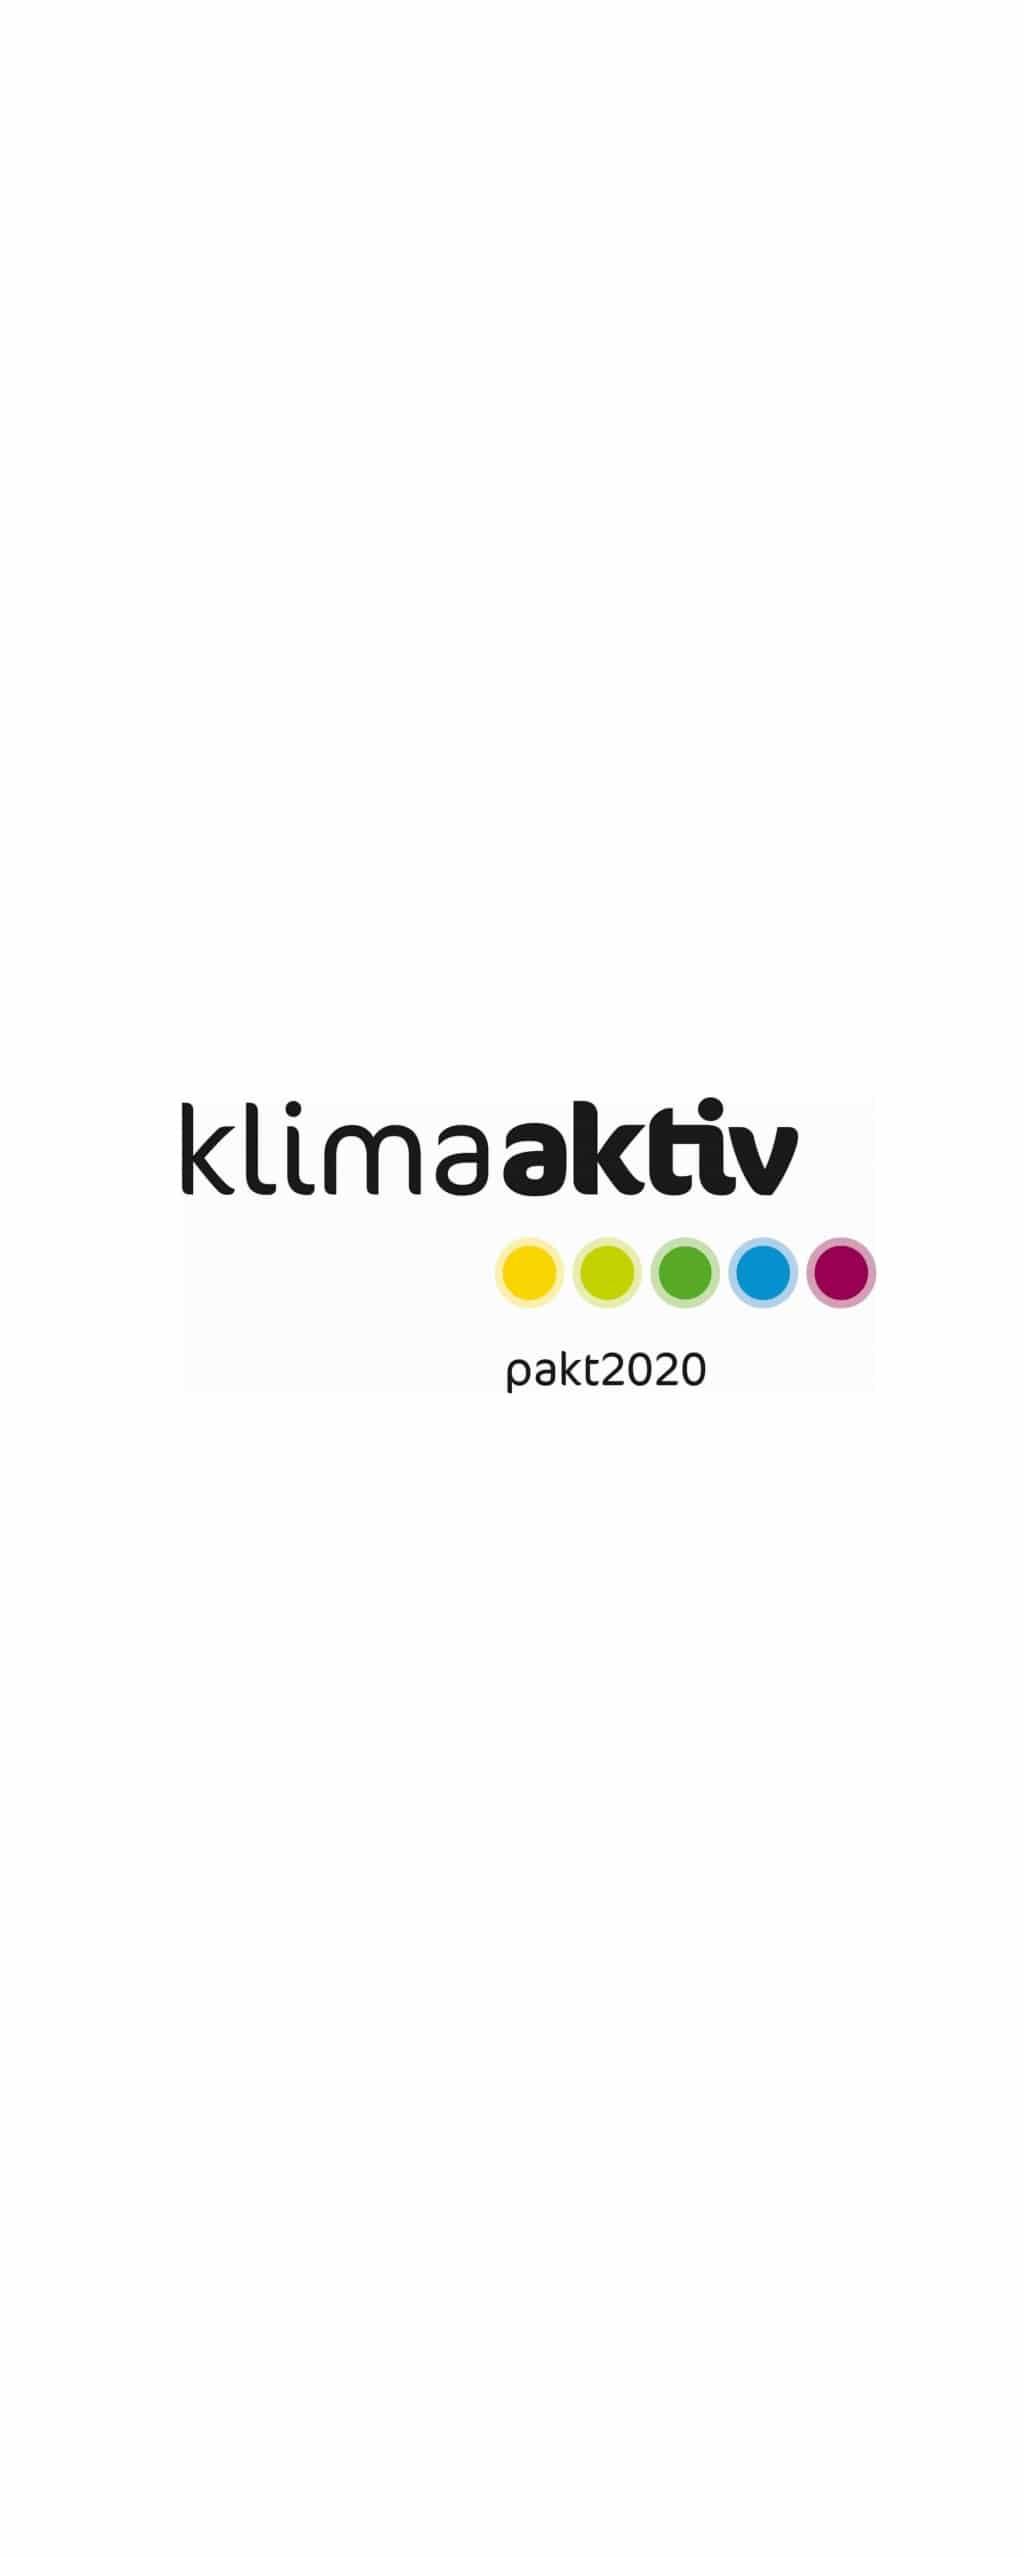 Logo klimaaktiv pakt2020